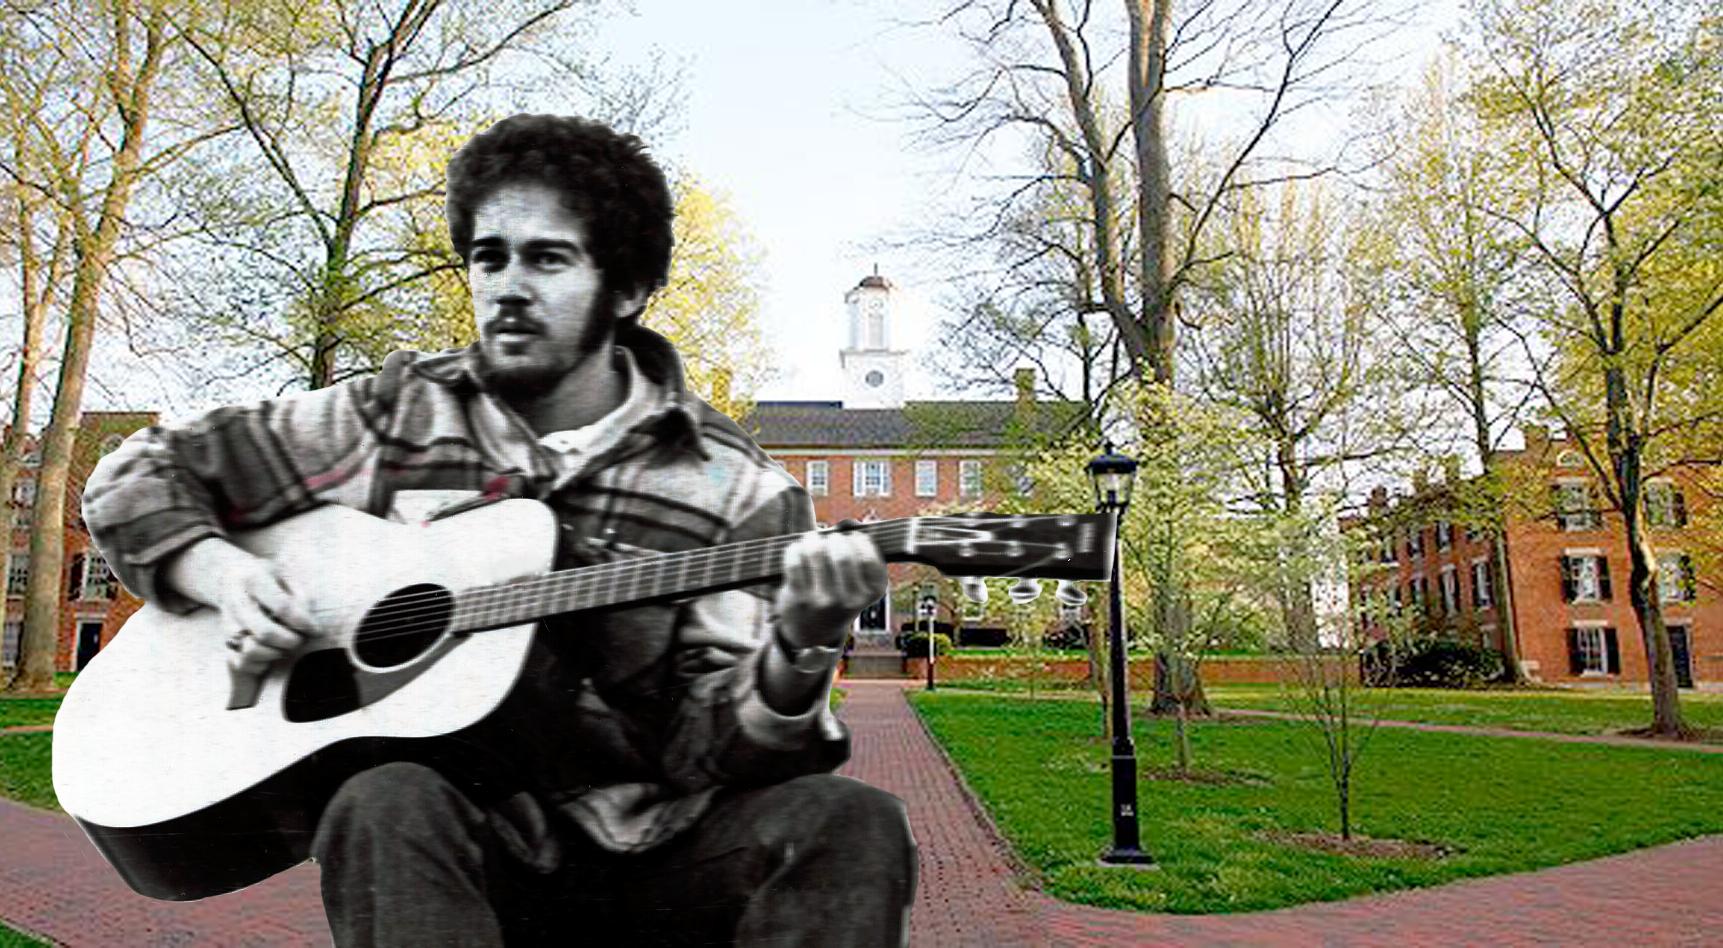 Bud Kraus playing guitar - College Green, Ohio U